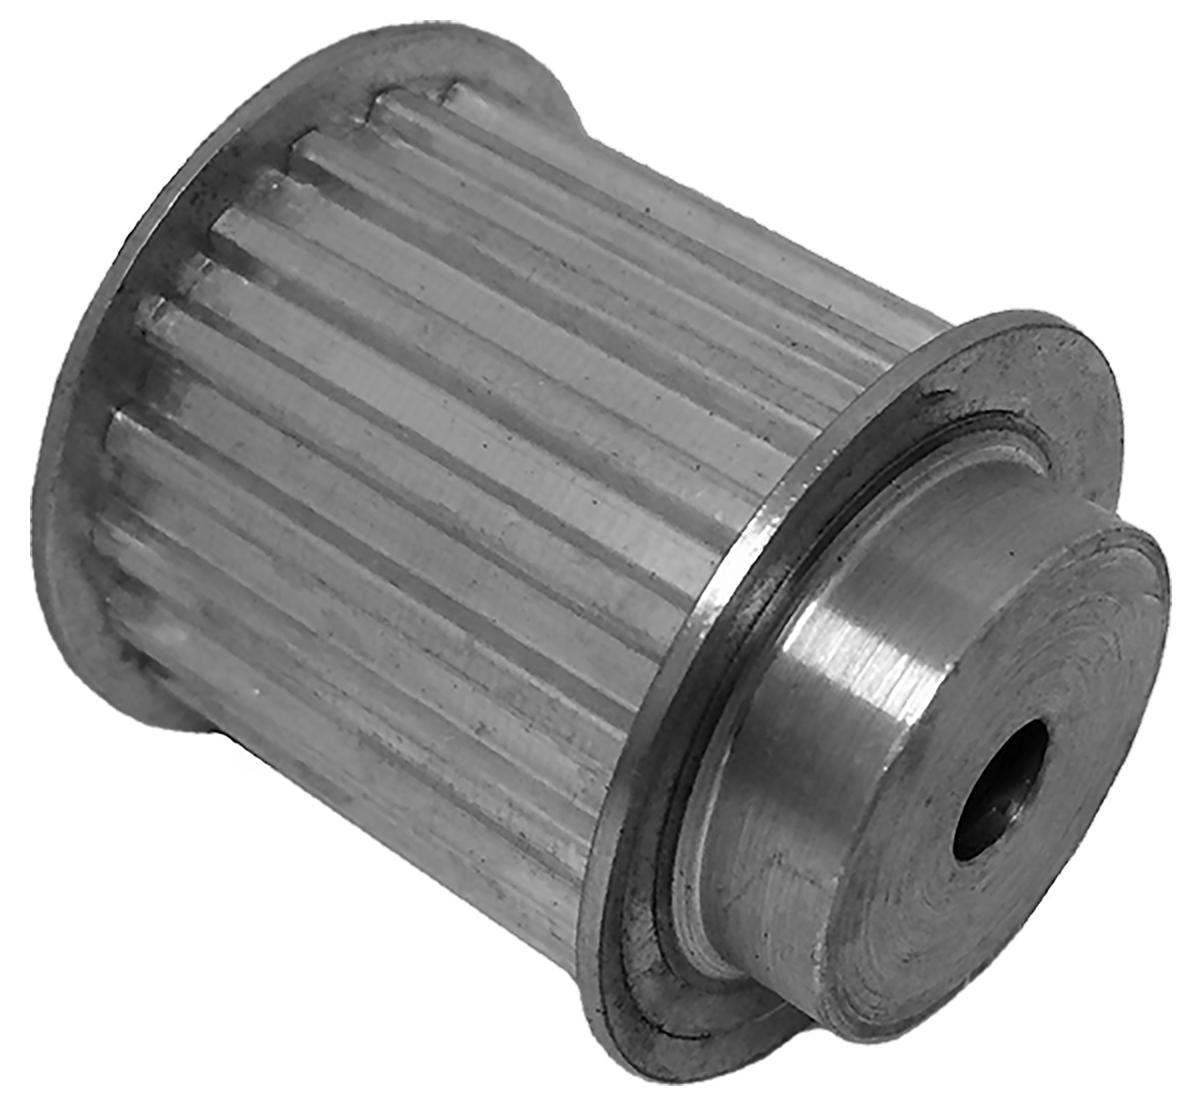 36T5/19-2 - Aluminum Metric Pulleys